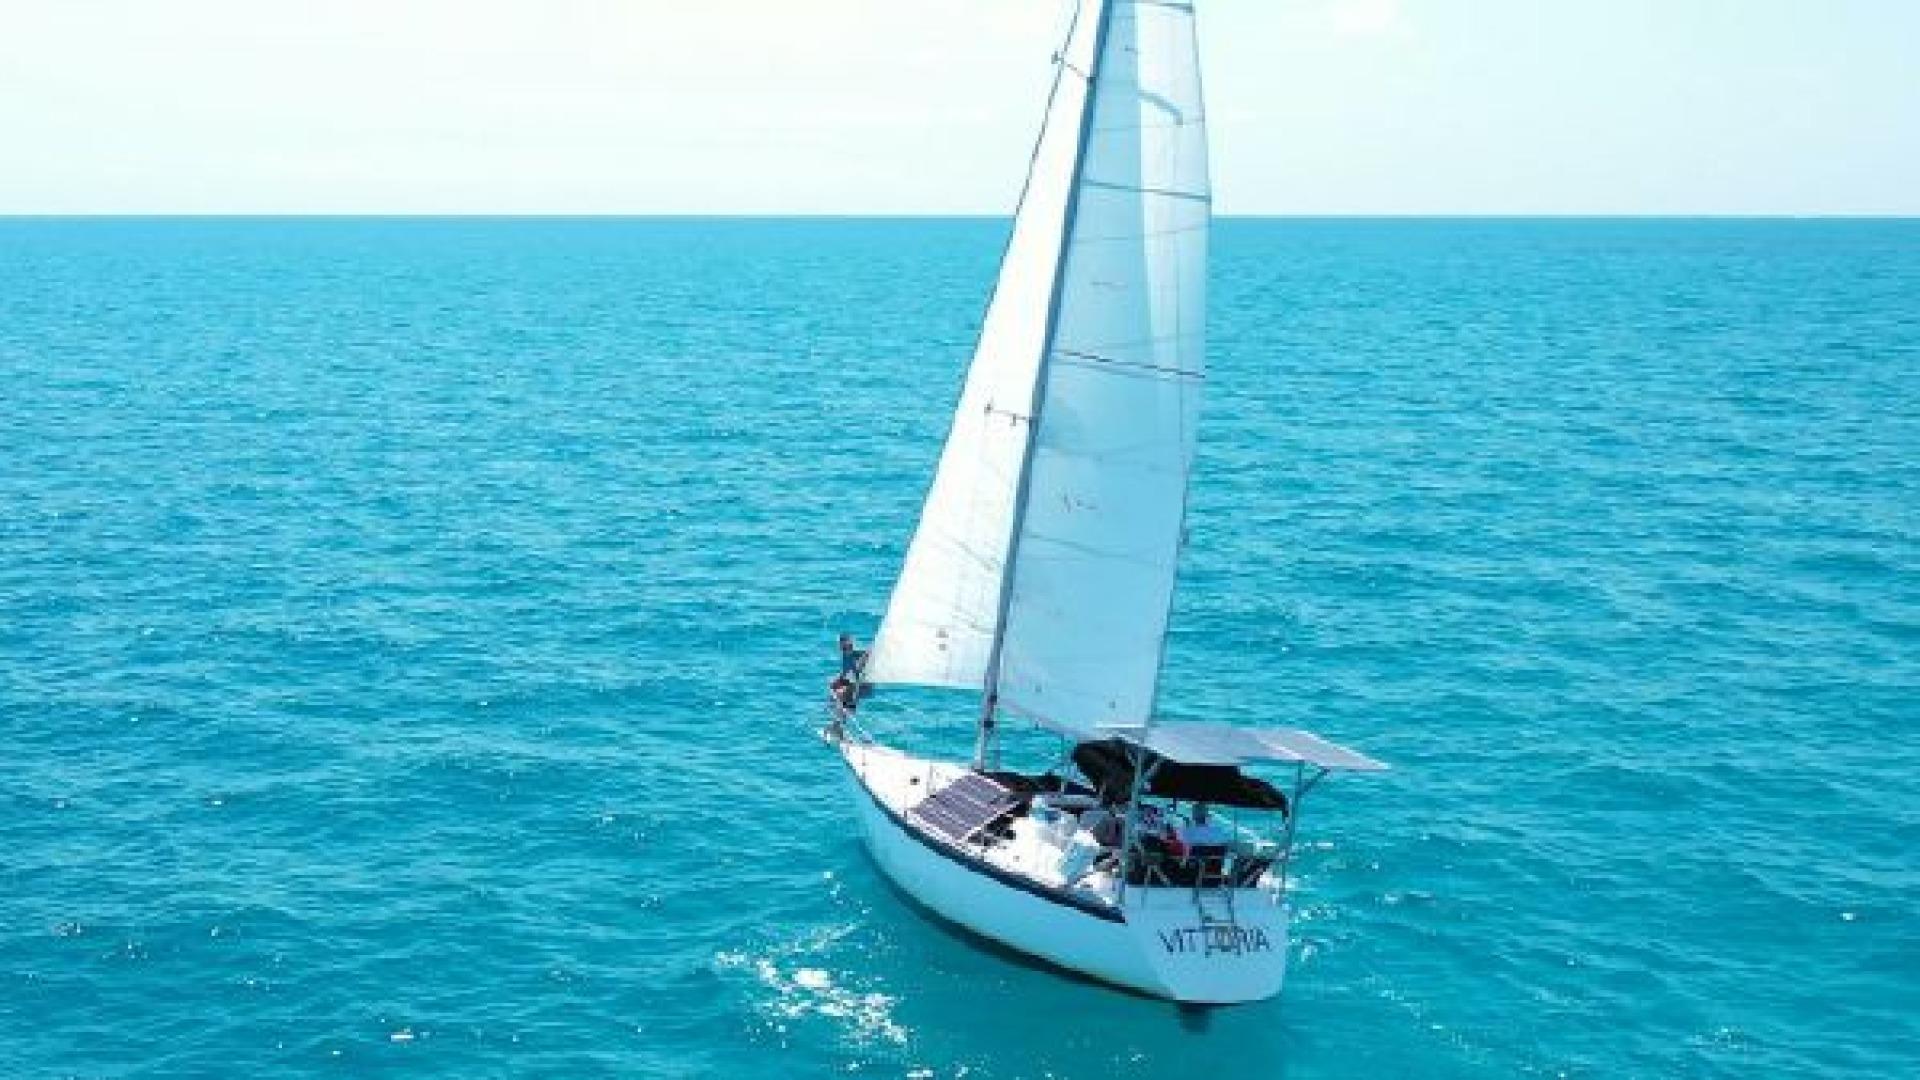 New or Used Hunter Sailboats and Sailing Yachts - Boats for